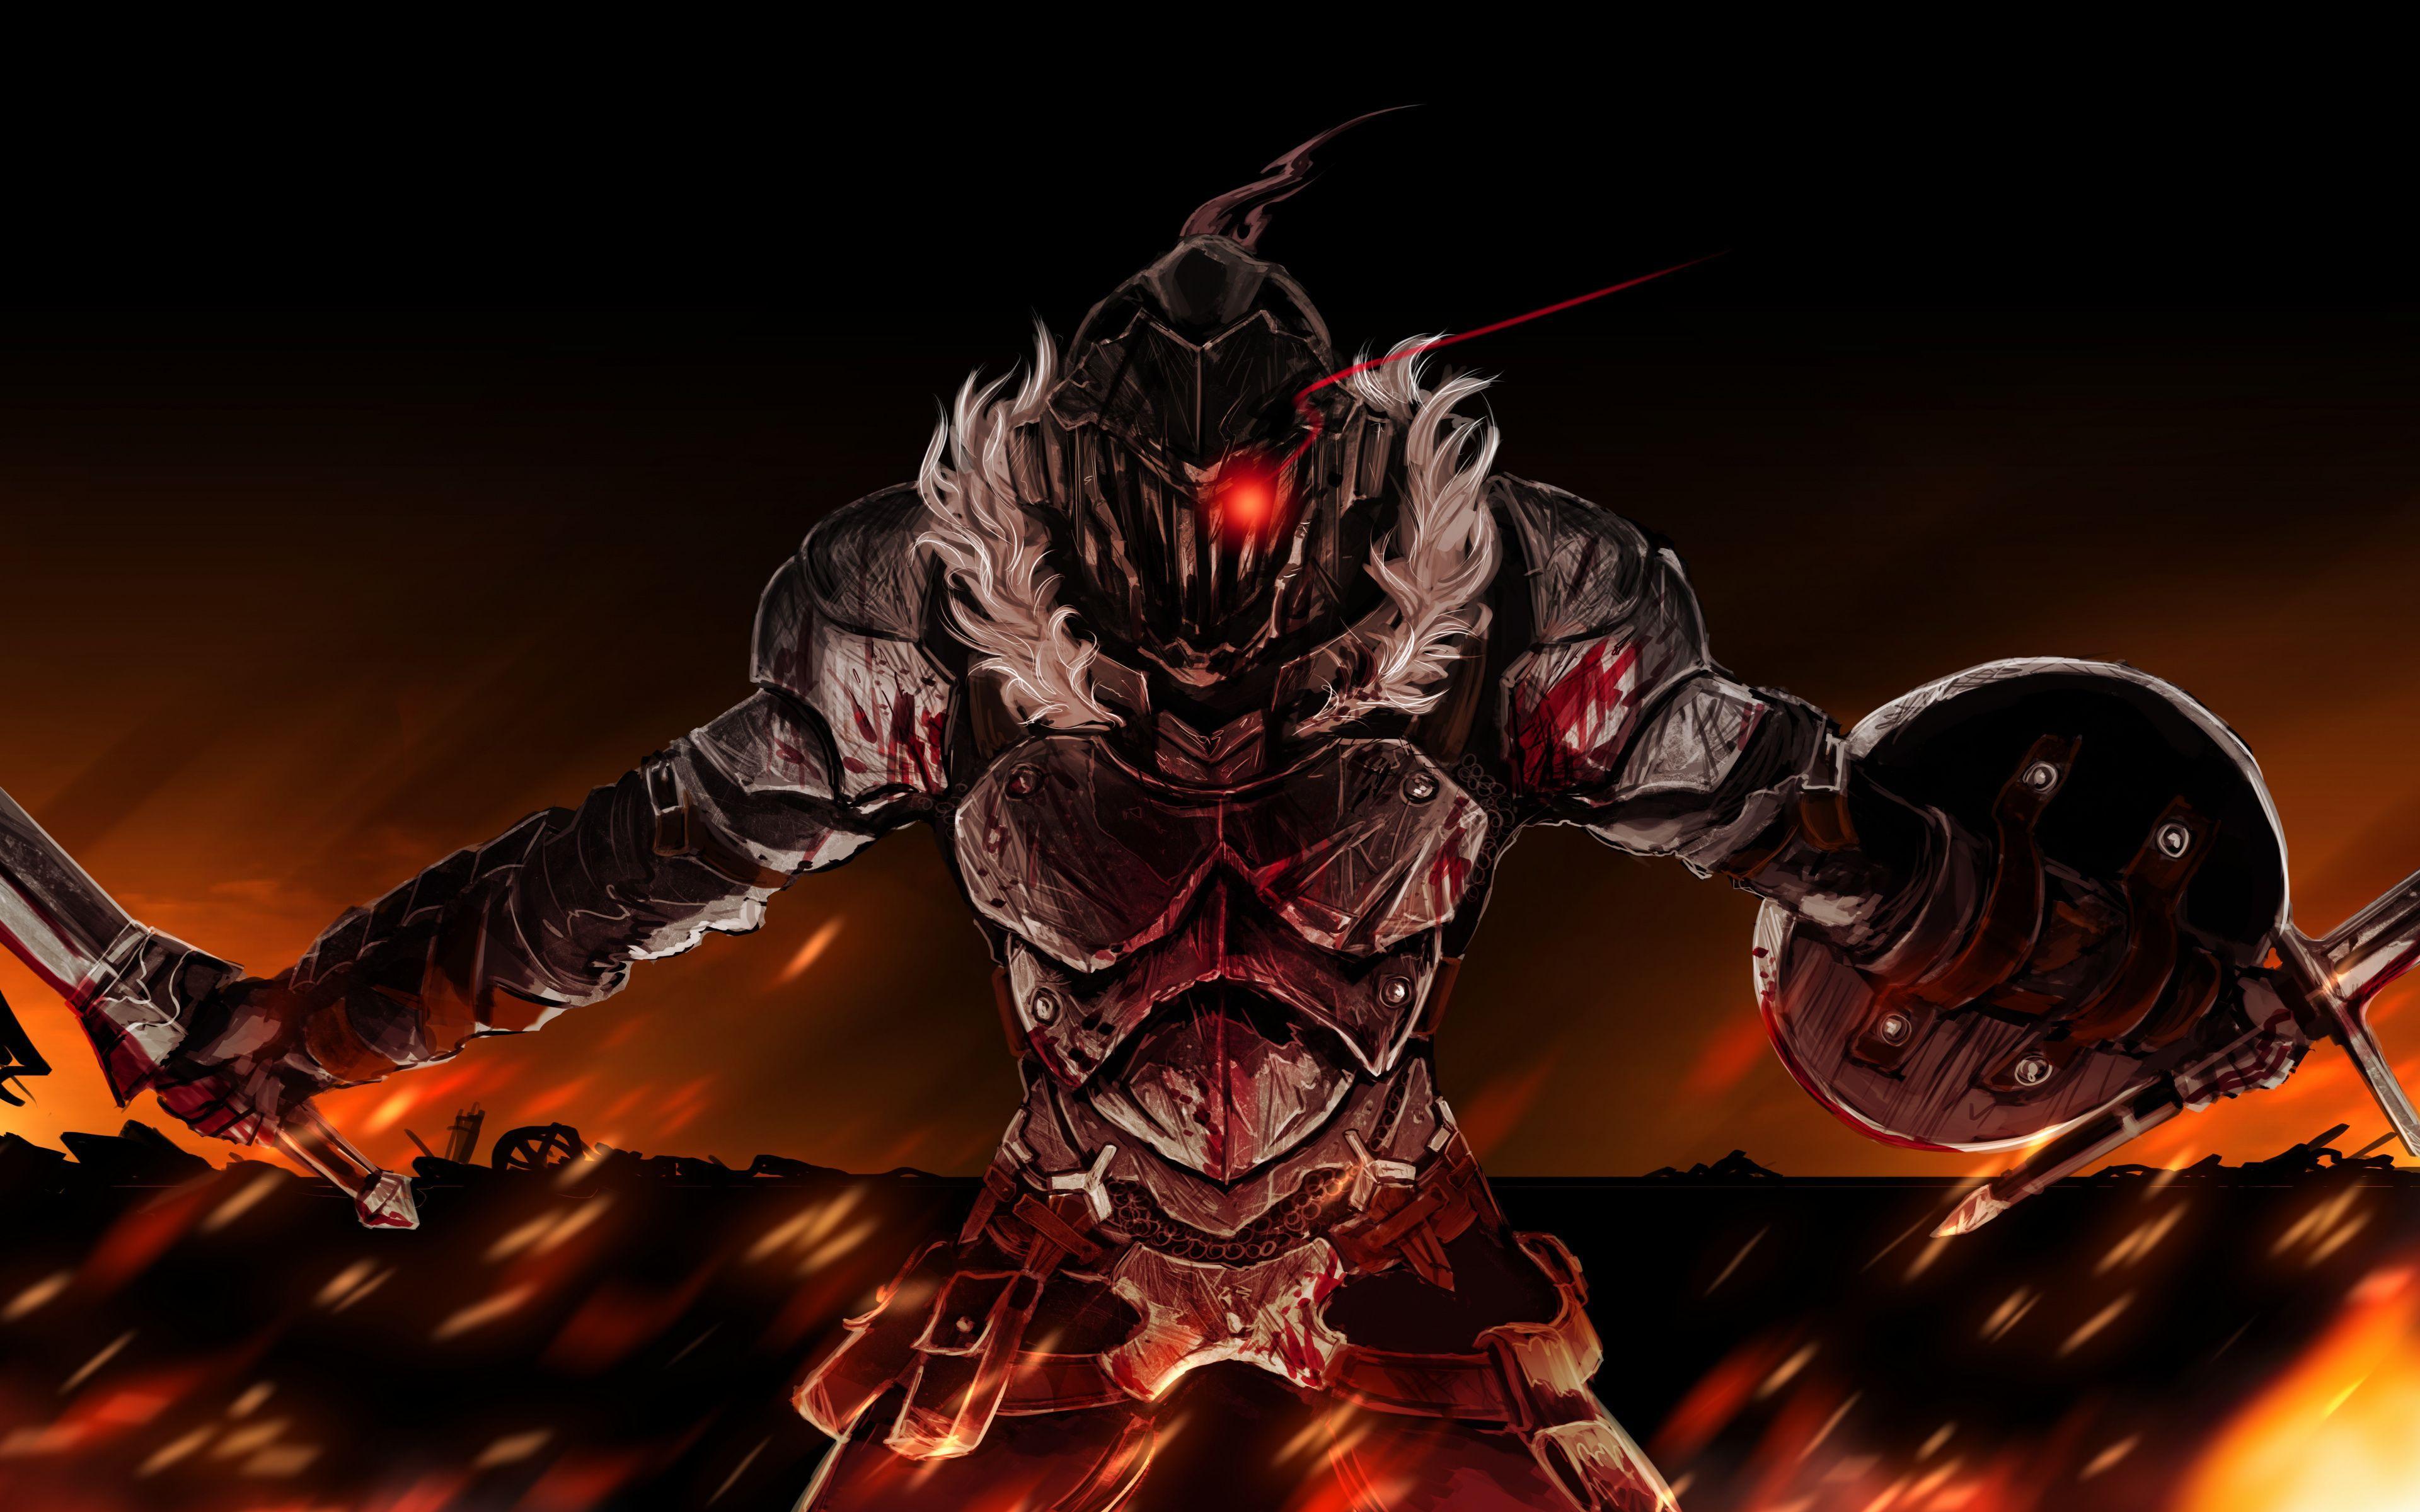 Goblin Slayer Wallpapers - Top Free Goblin Slayer Backgrounds - WallpaperAccess